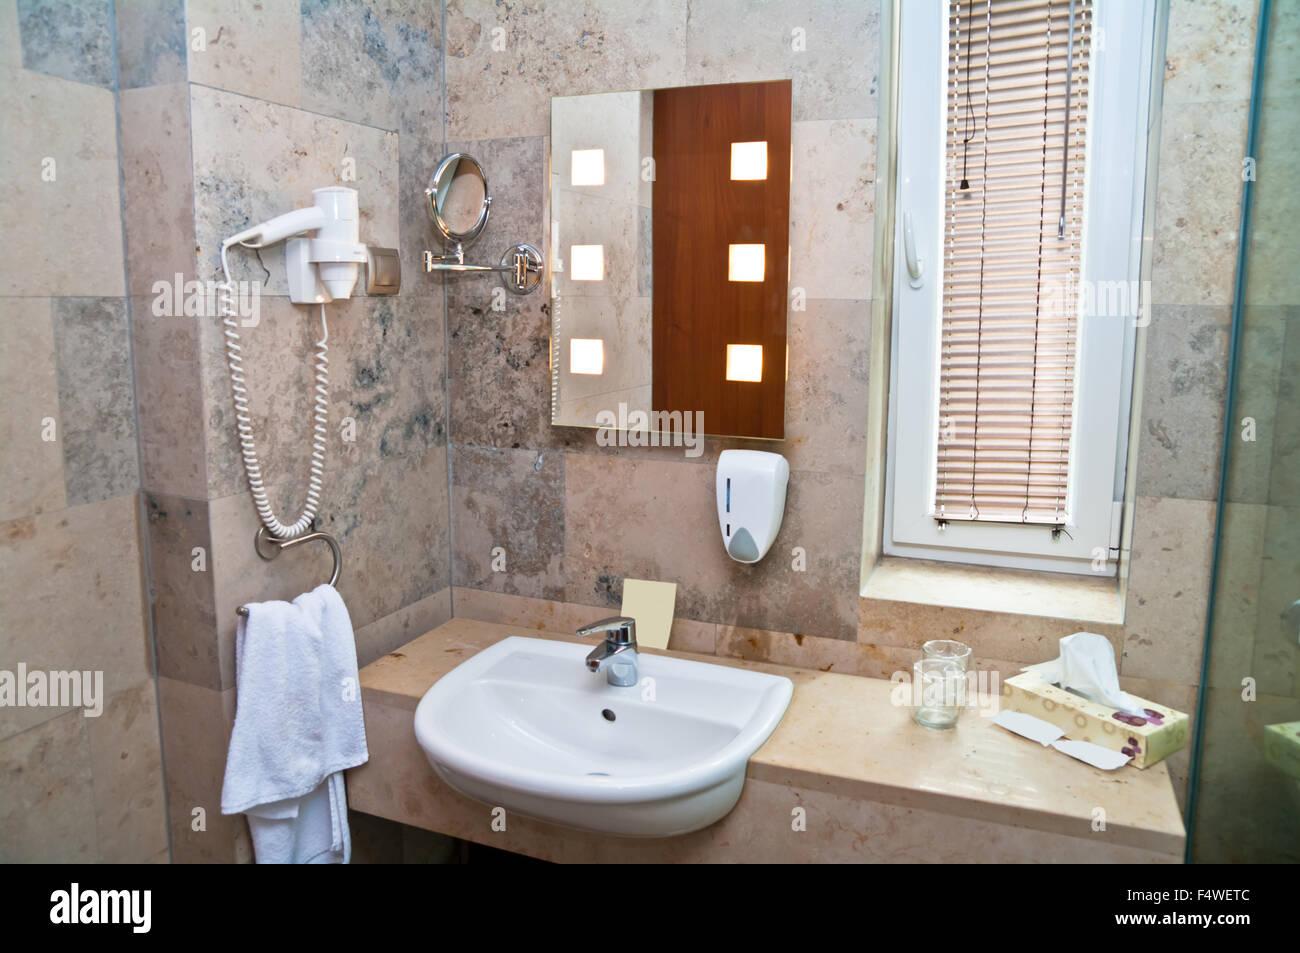 Salle De Bain Lumineuse Design ~ salle de bain baignoire baignoire architecture propre et confortable